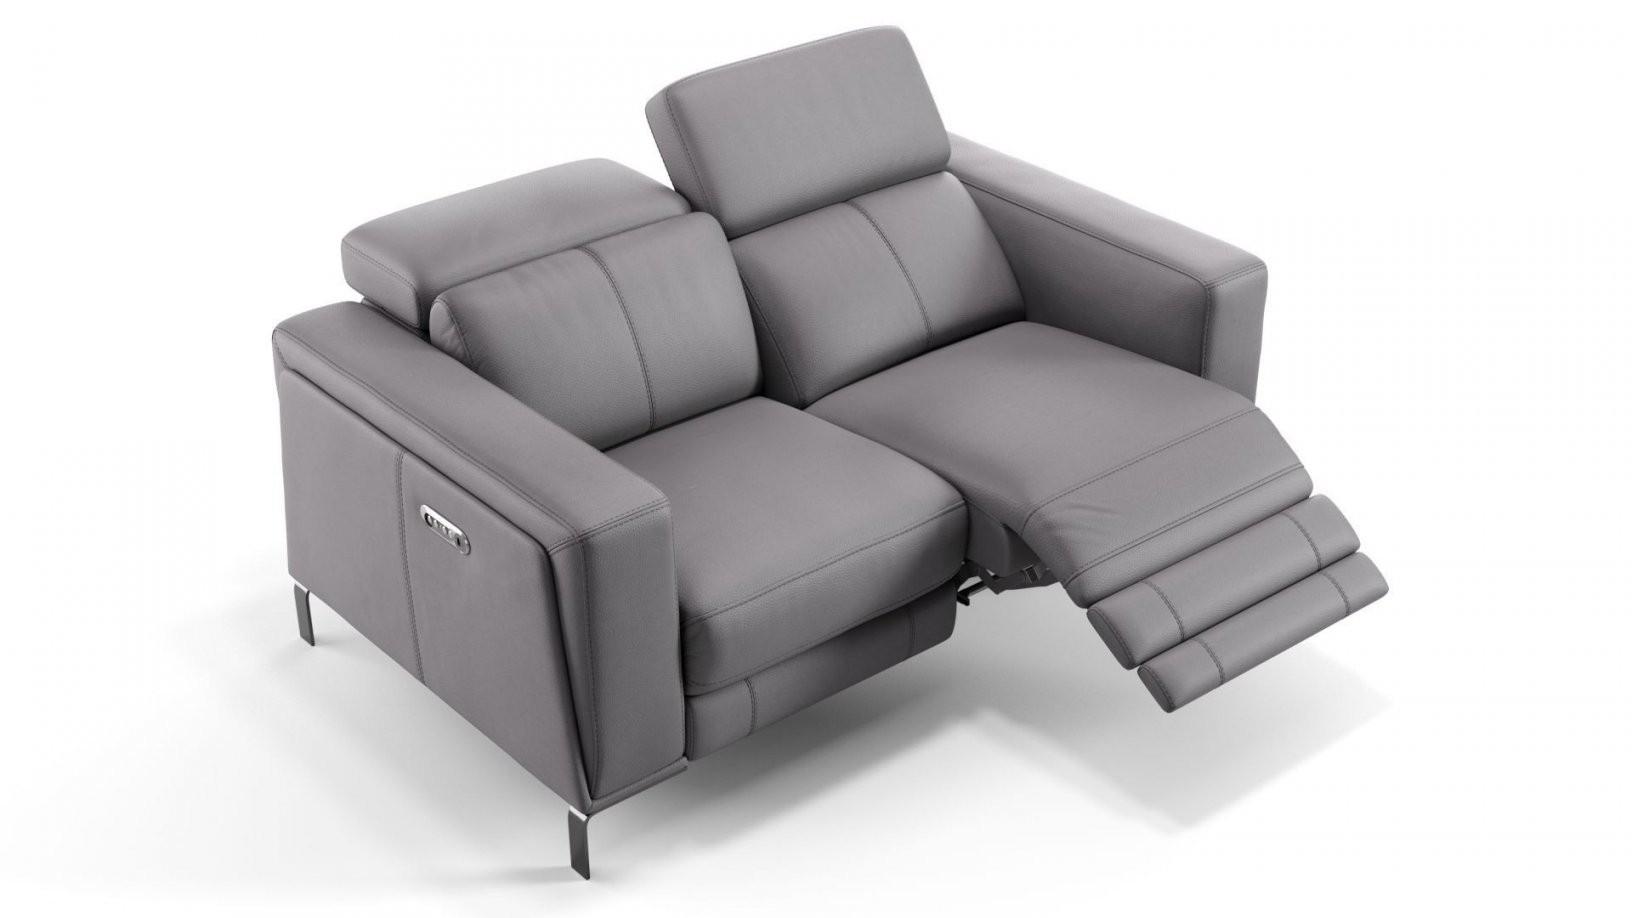 Relax Sofa Das Beste Von Relaxsofa Leder 2 Sitzer Sofa Casoli von Relax Sofa 2 Sitzer Bild